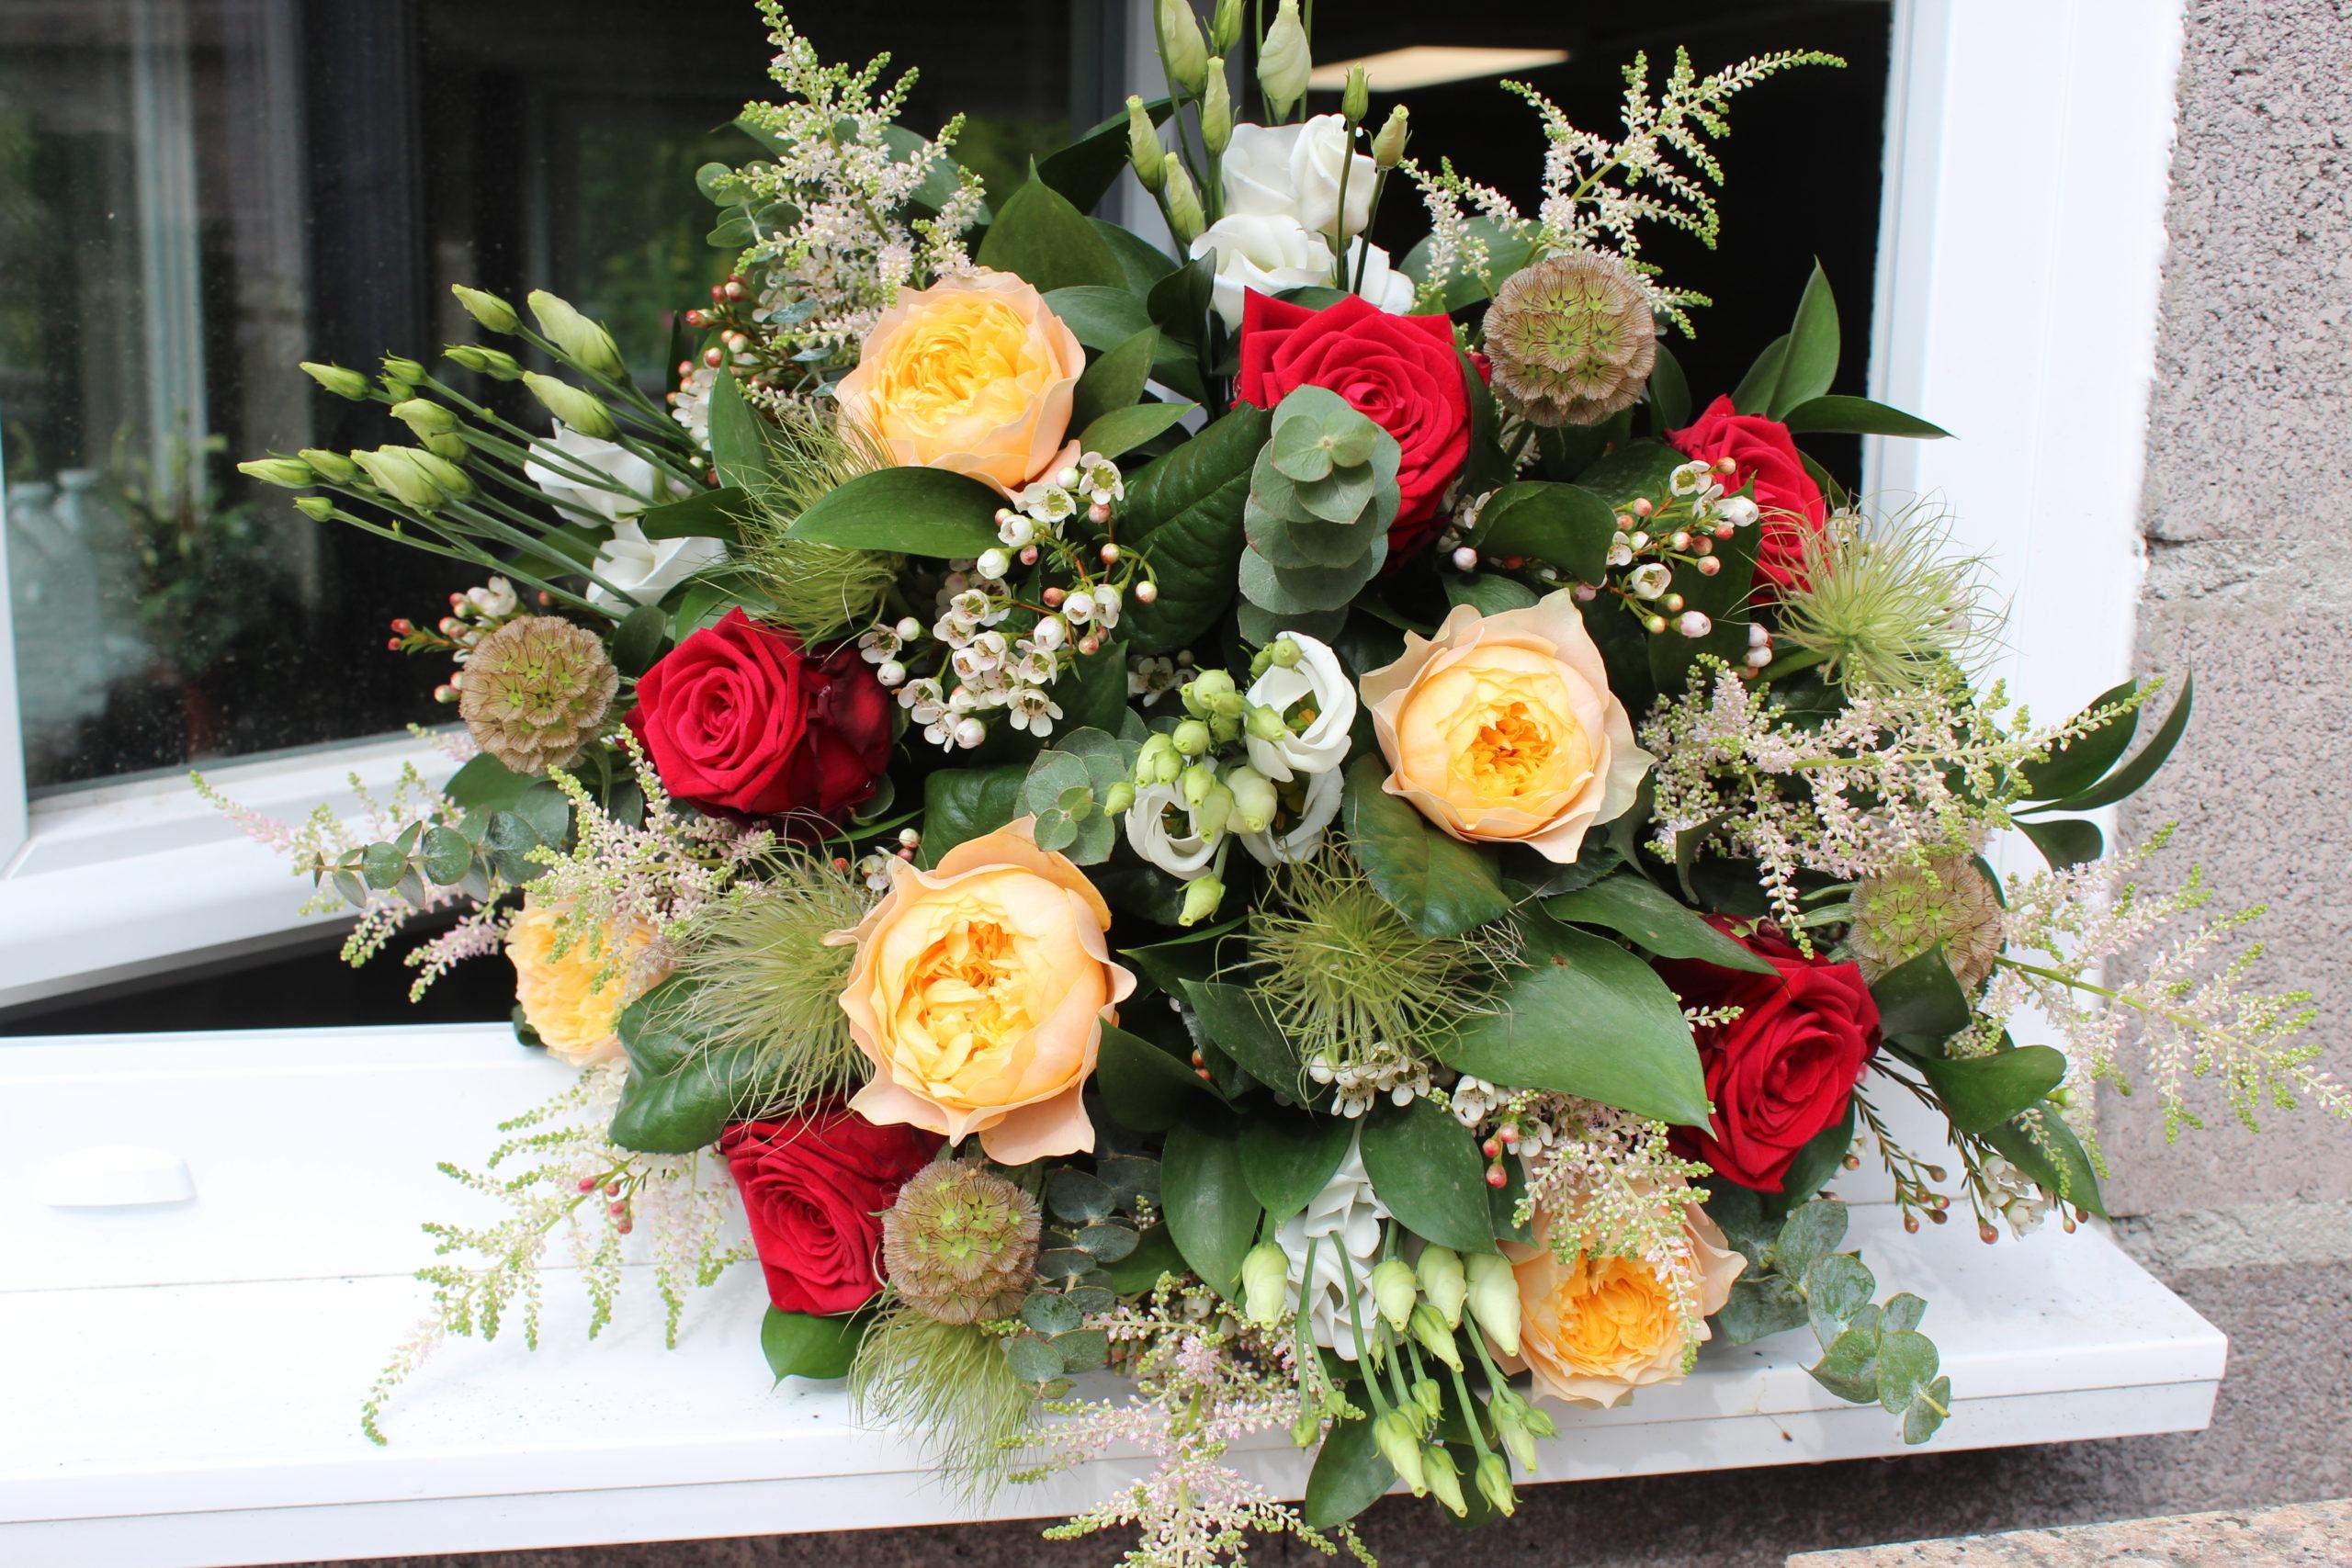 bouquet de fleurs fraiches rose rouge rose de jardin jaune eucalyptus fleuriste metz effleurs